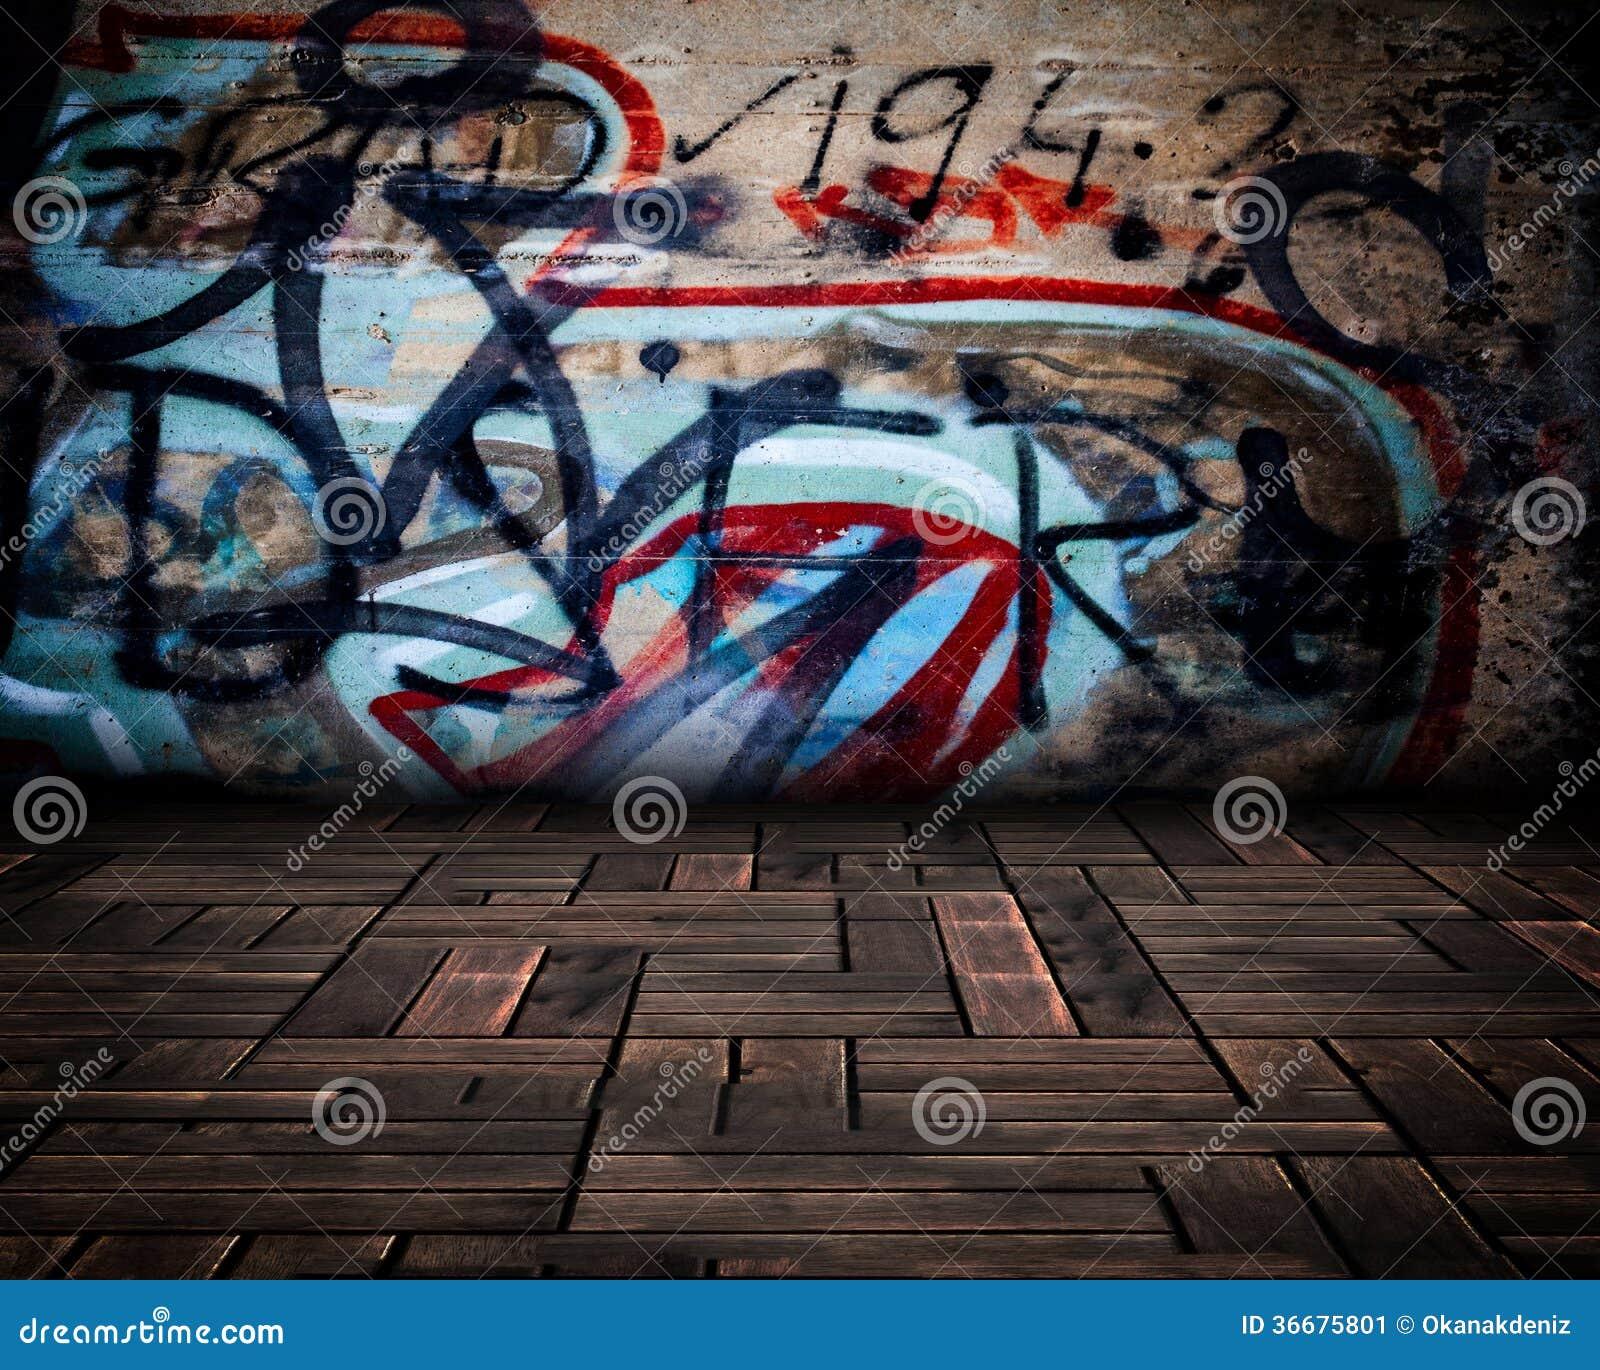 st dtischer stadiums graffiti raum stockbild bild 36675801. Black Bedroom Furniture Sets. Home Design Ideas